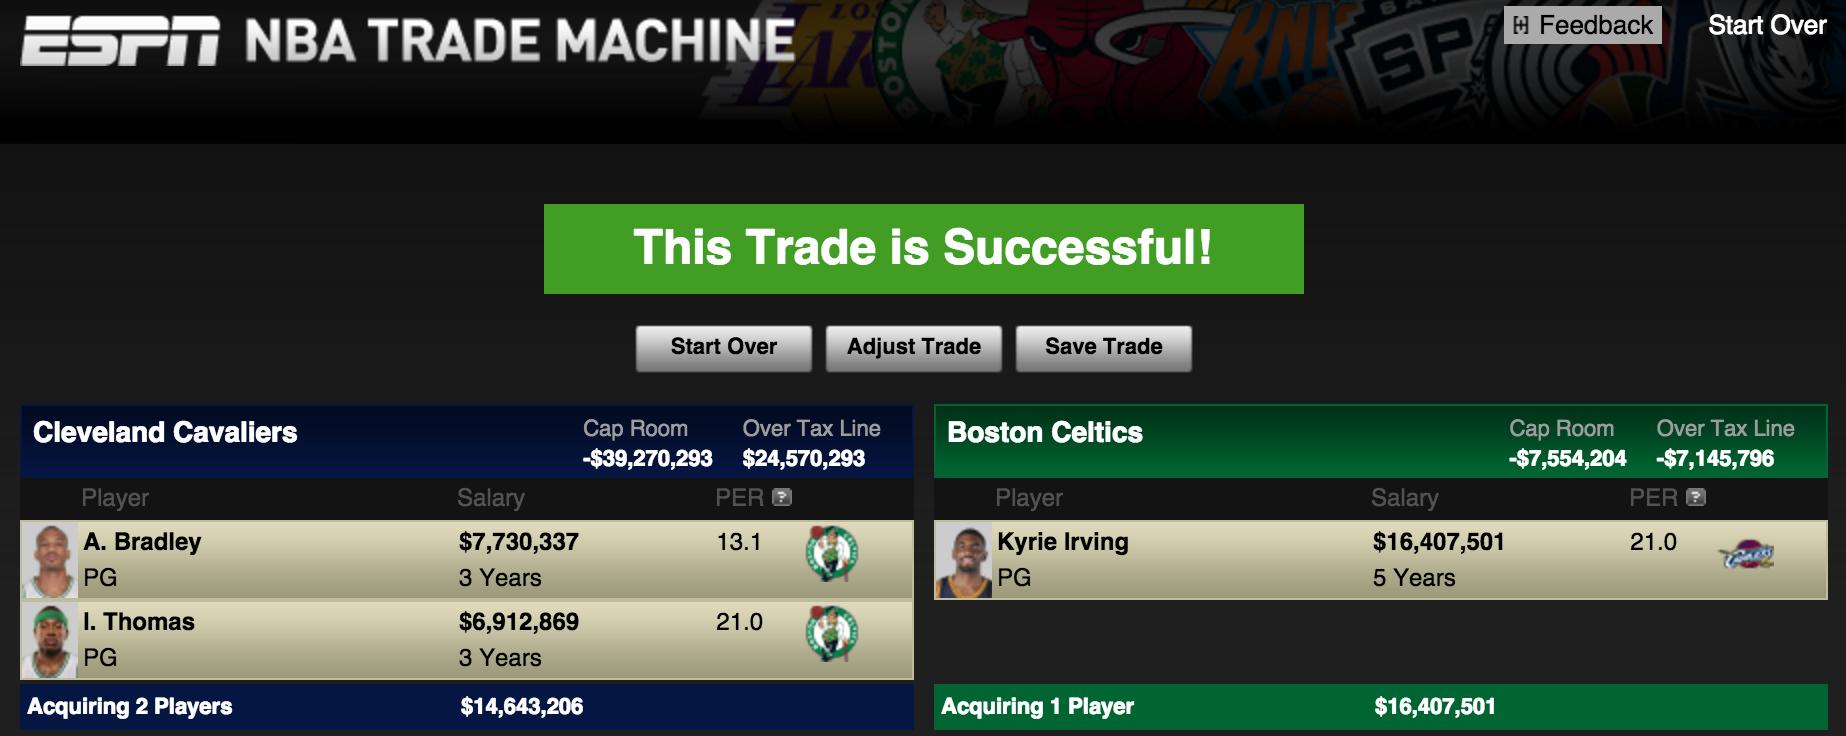 Celtics trade options 2016